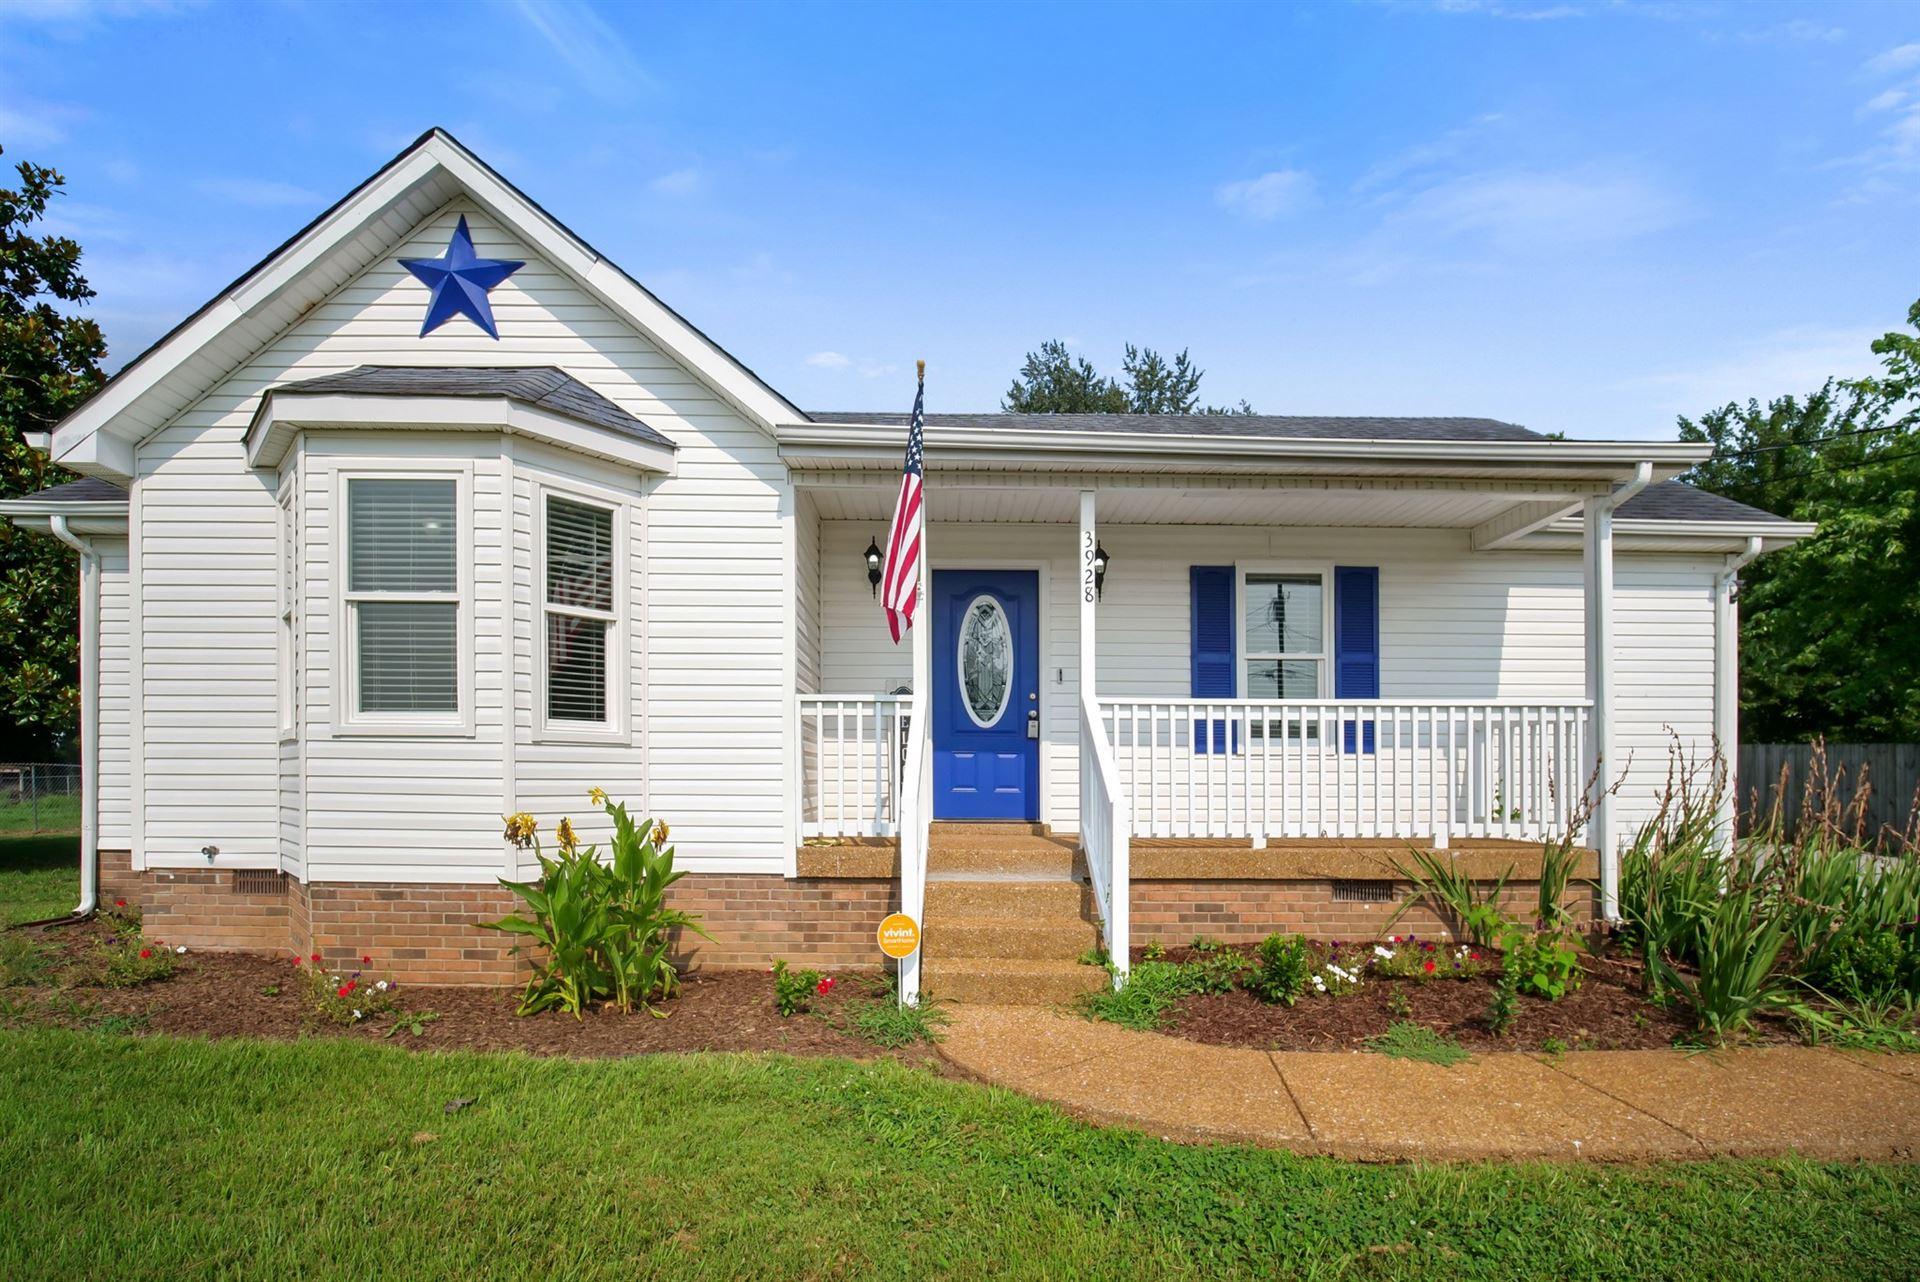 3928 Hearthstone Dr, Chapel Hill, TN 37034 - MLS#: 2264811